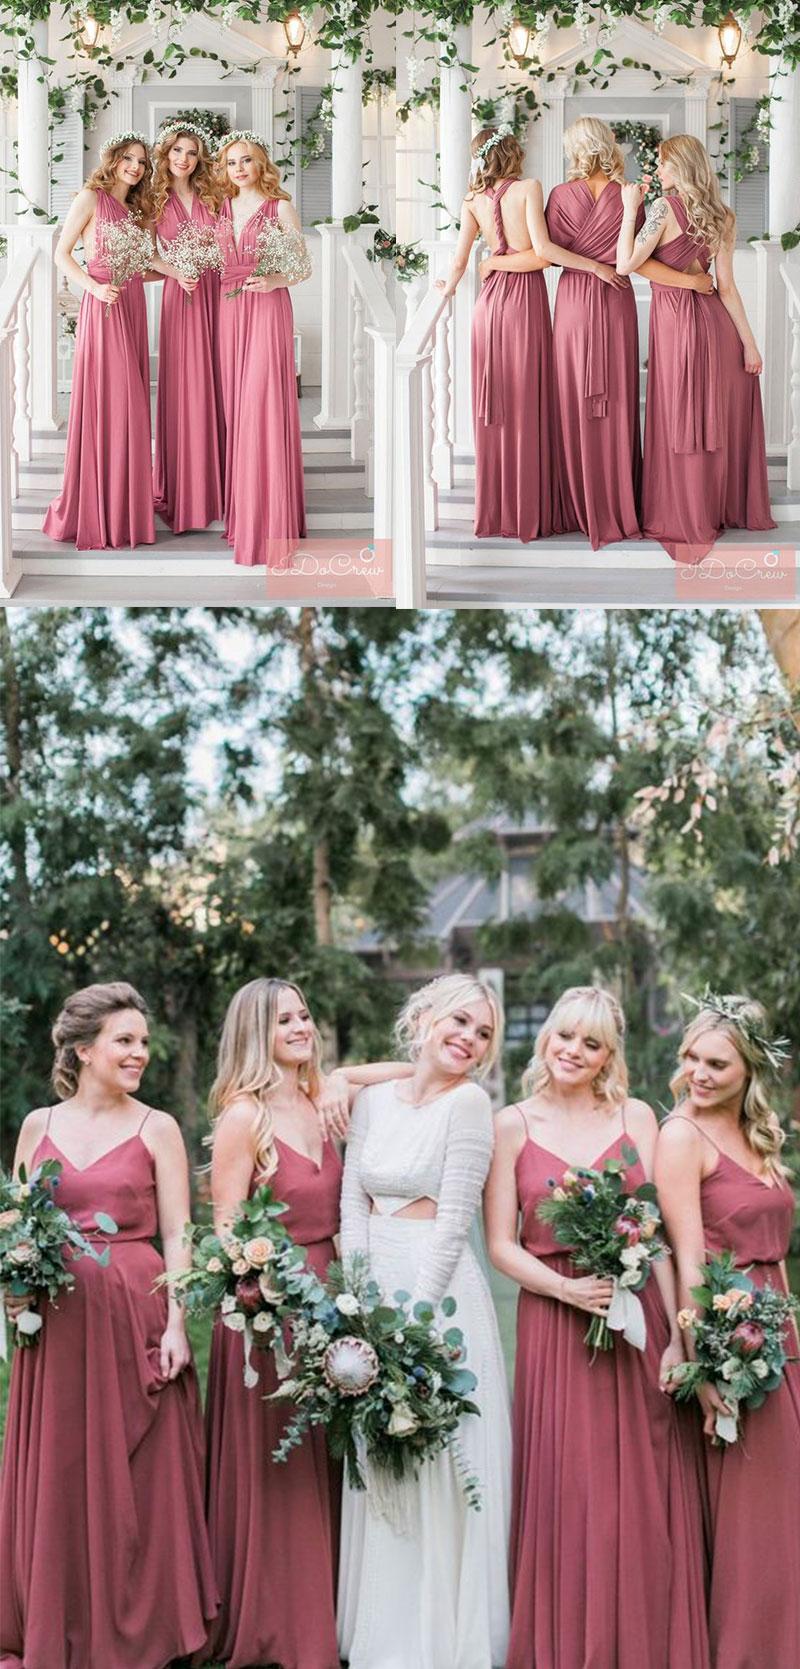 cf1f27e6c1d8 30+ Trendy Dusty Rose Wedding Color Ideas You'll Love - WedNova Blog